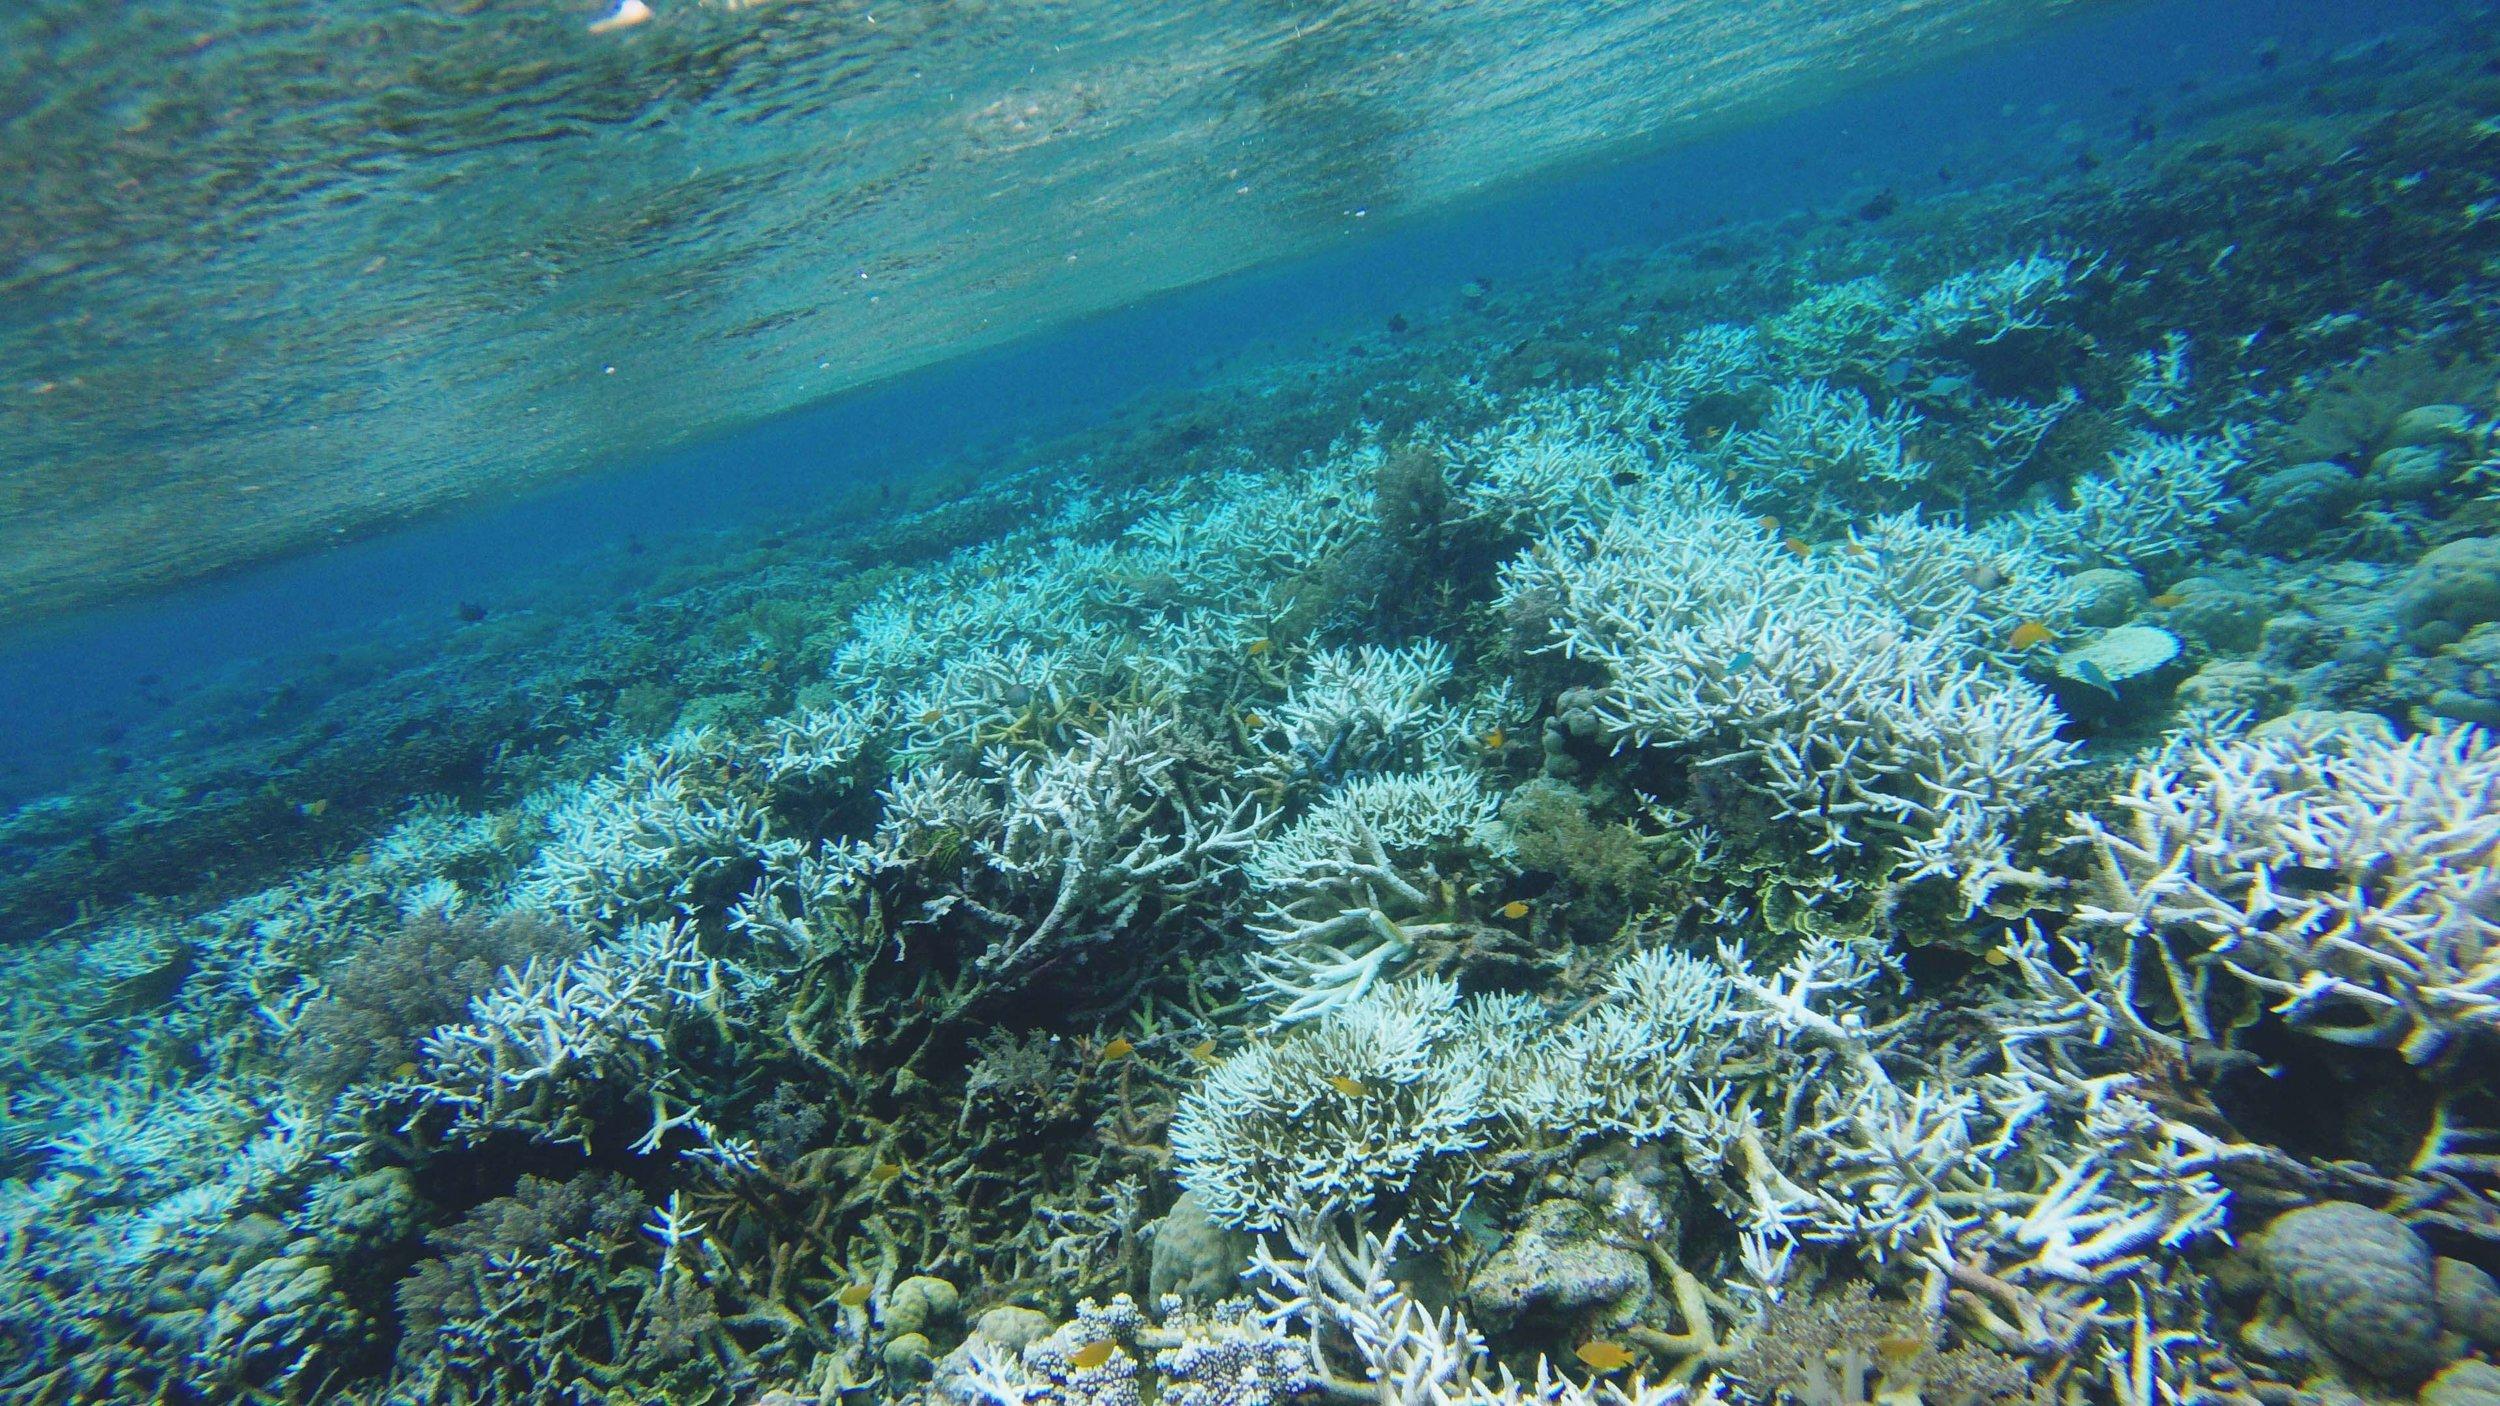 Sulawesi soul of wakatobi 2.jpg